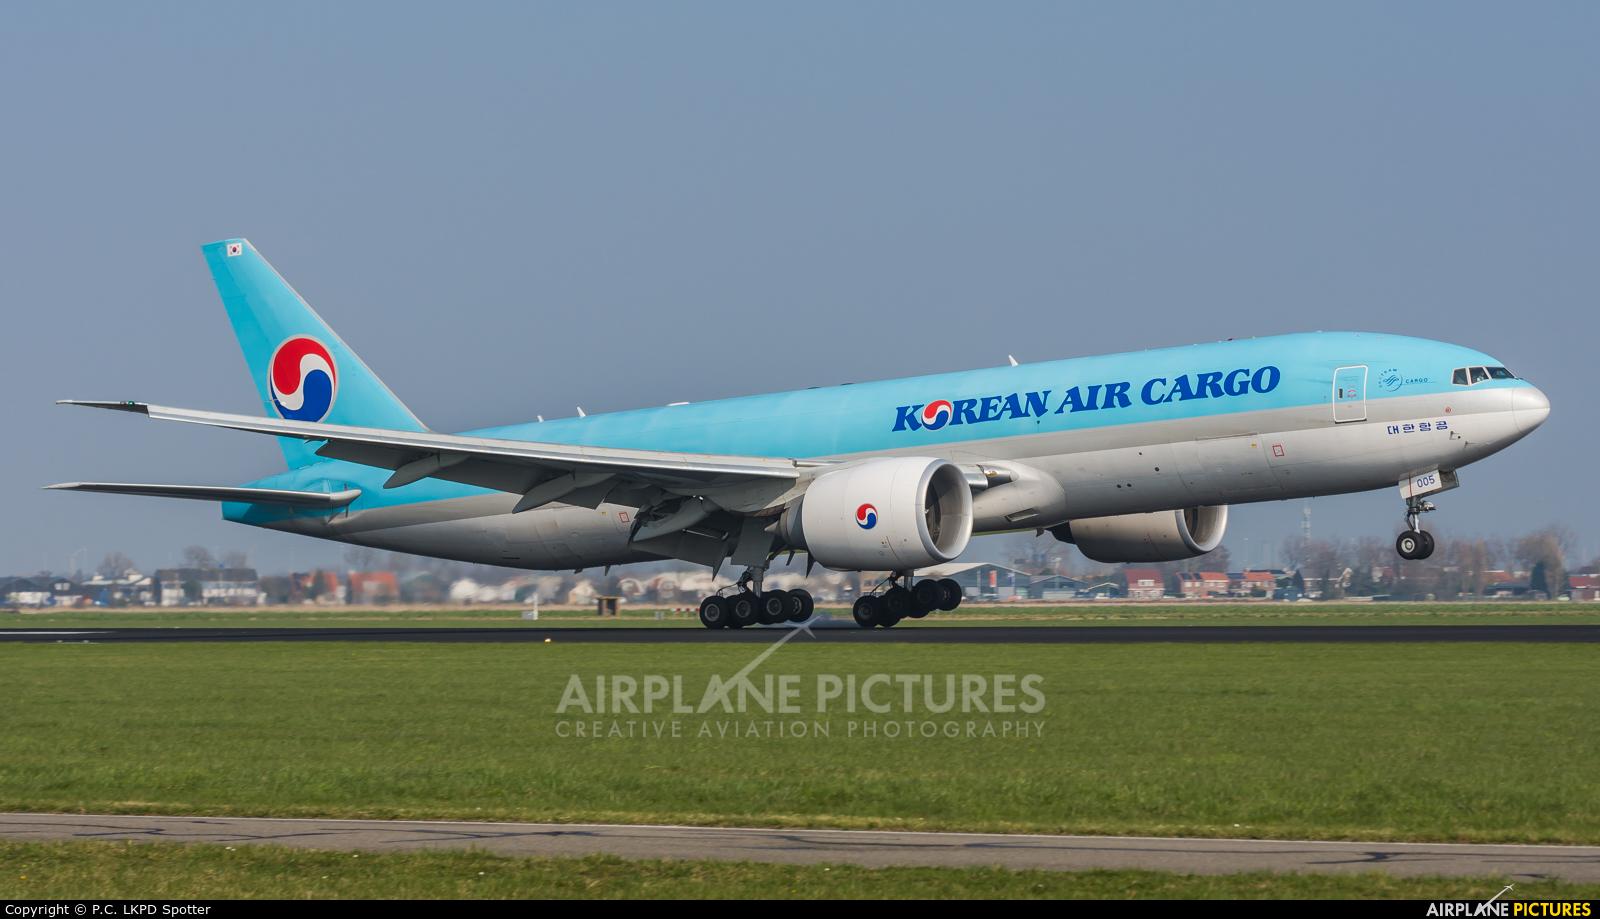 Korean Air Cargo HL8005 aircraft at Amsterdam - Schiphol